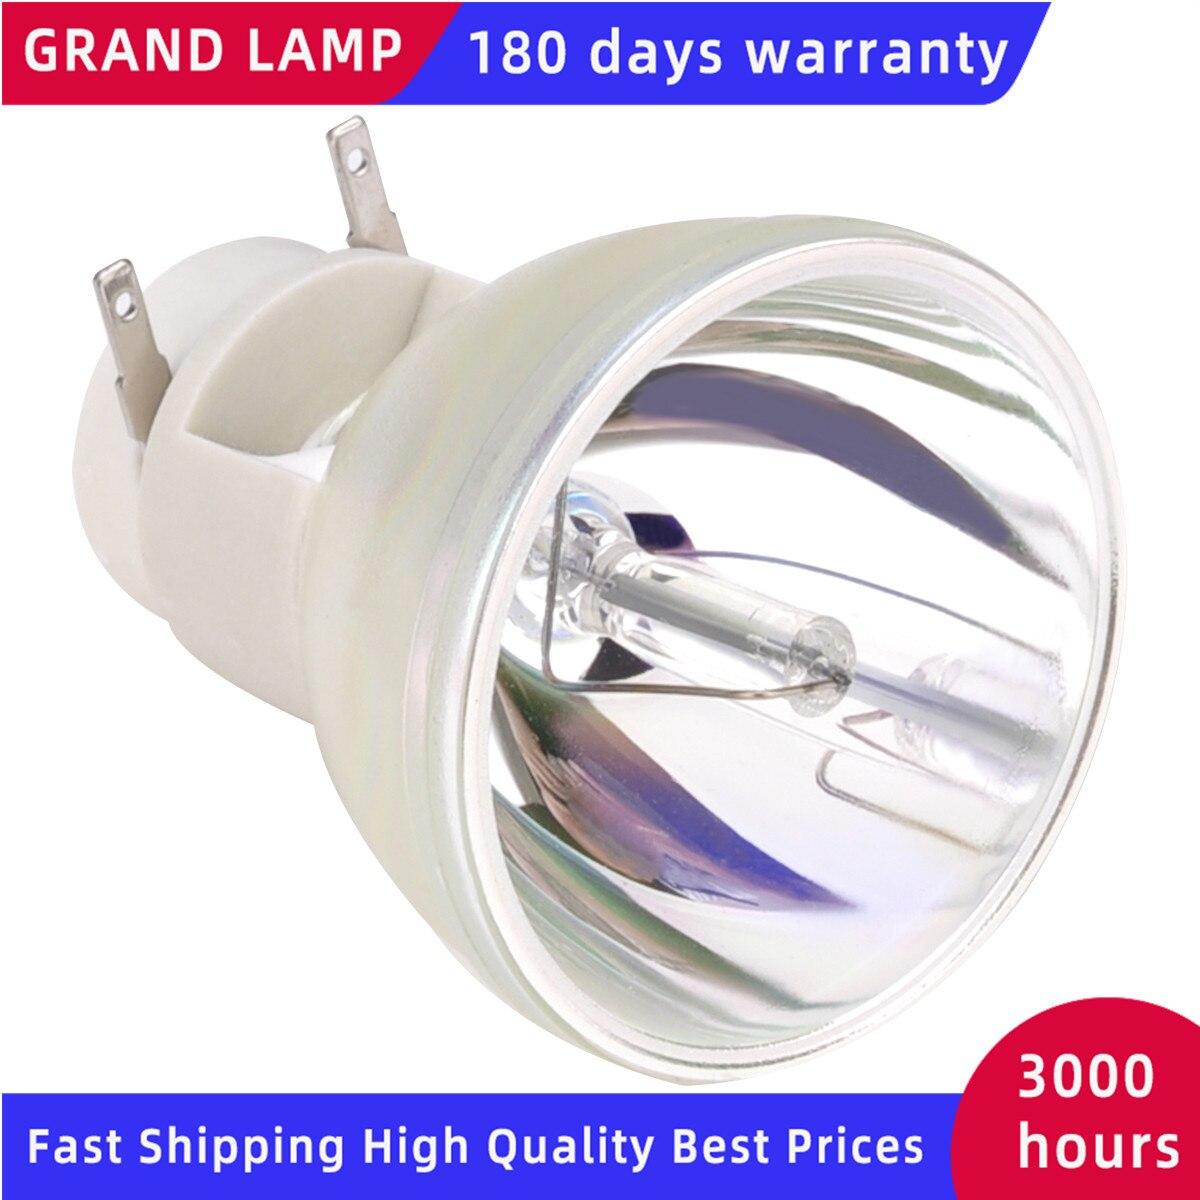 Совместимая лампа MC.JH511.004 P-VIP 180/0.8 E20.8 для Acer P1173 X1173 X1173A X1273, Лампа для проектора HAPPY BATE